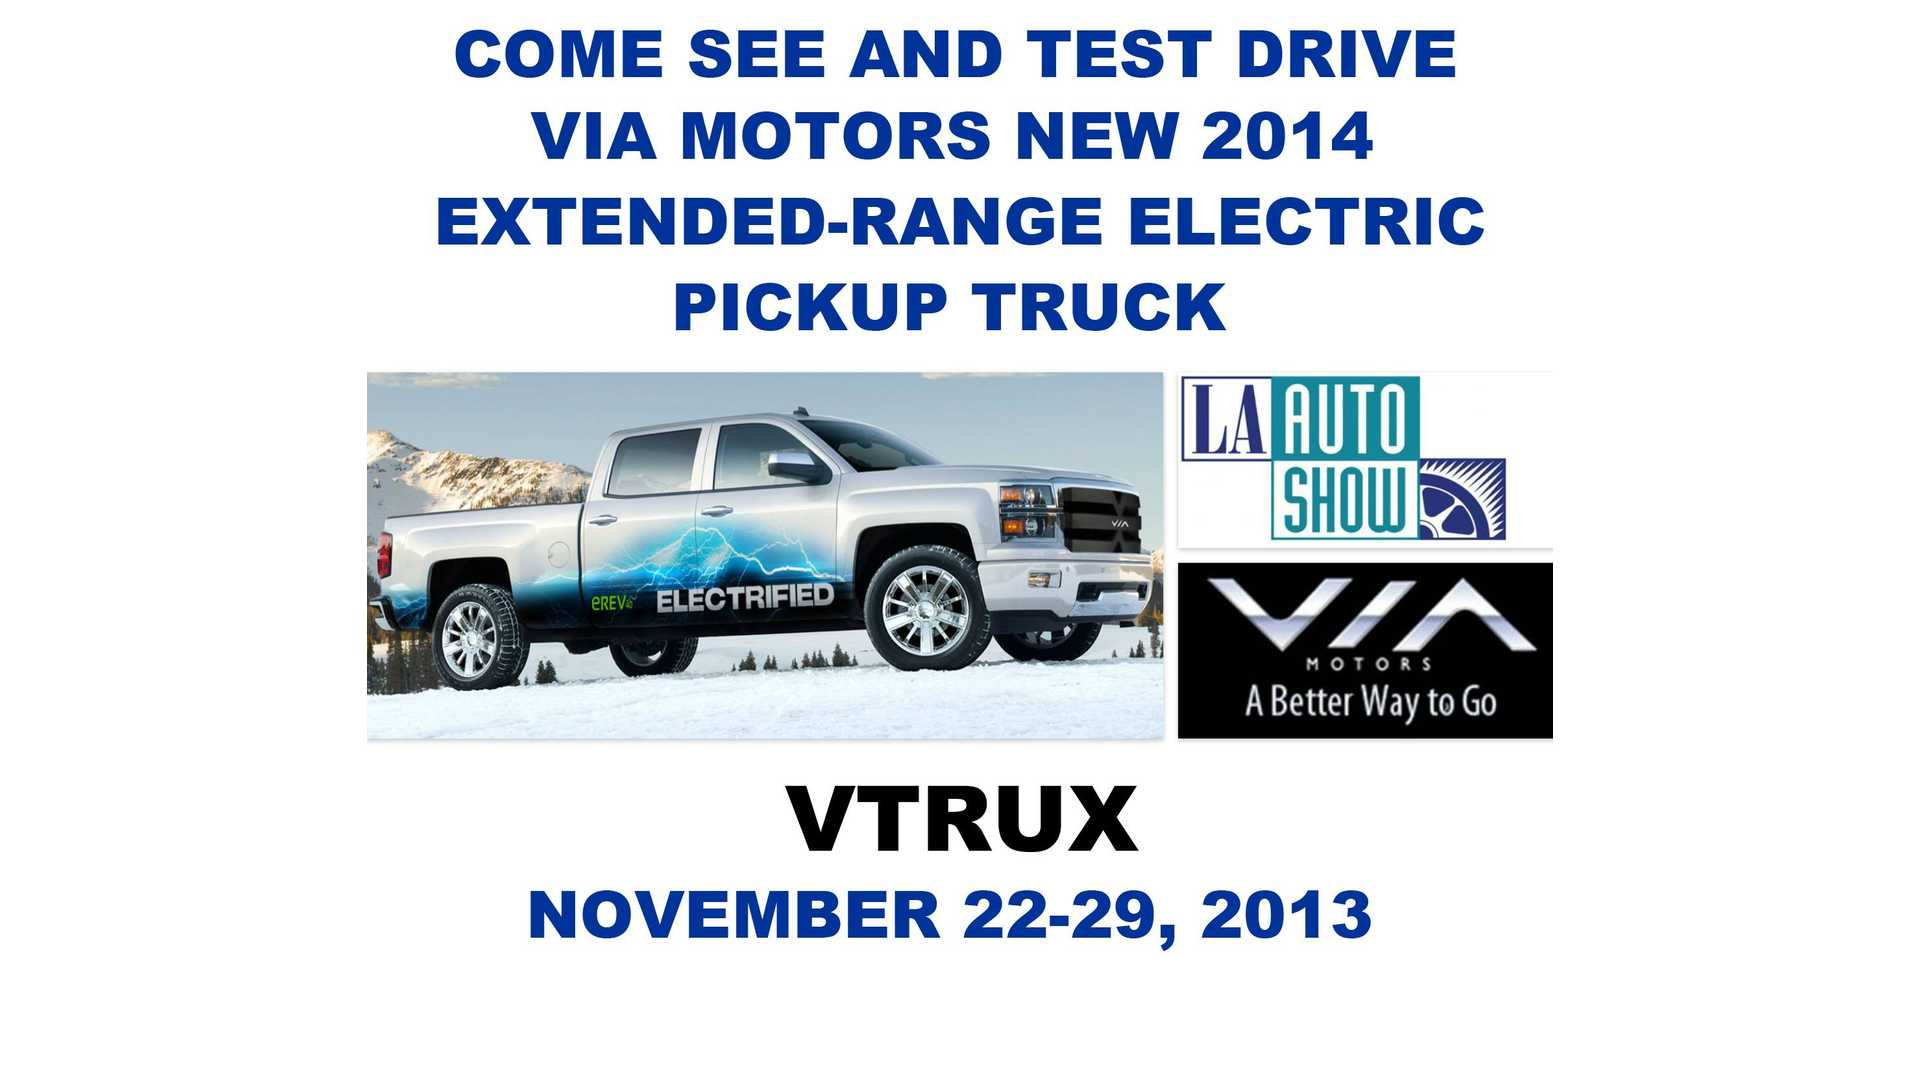 Via Motors Vtrux To Be Available For Public Test Drives At La Auto Show Unveil Surprise In Too